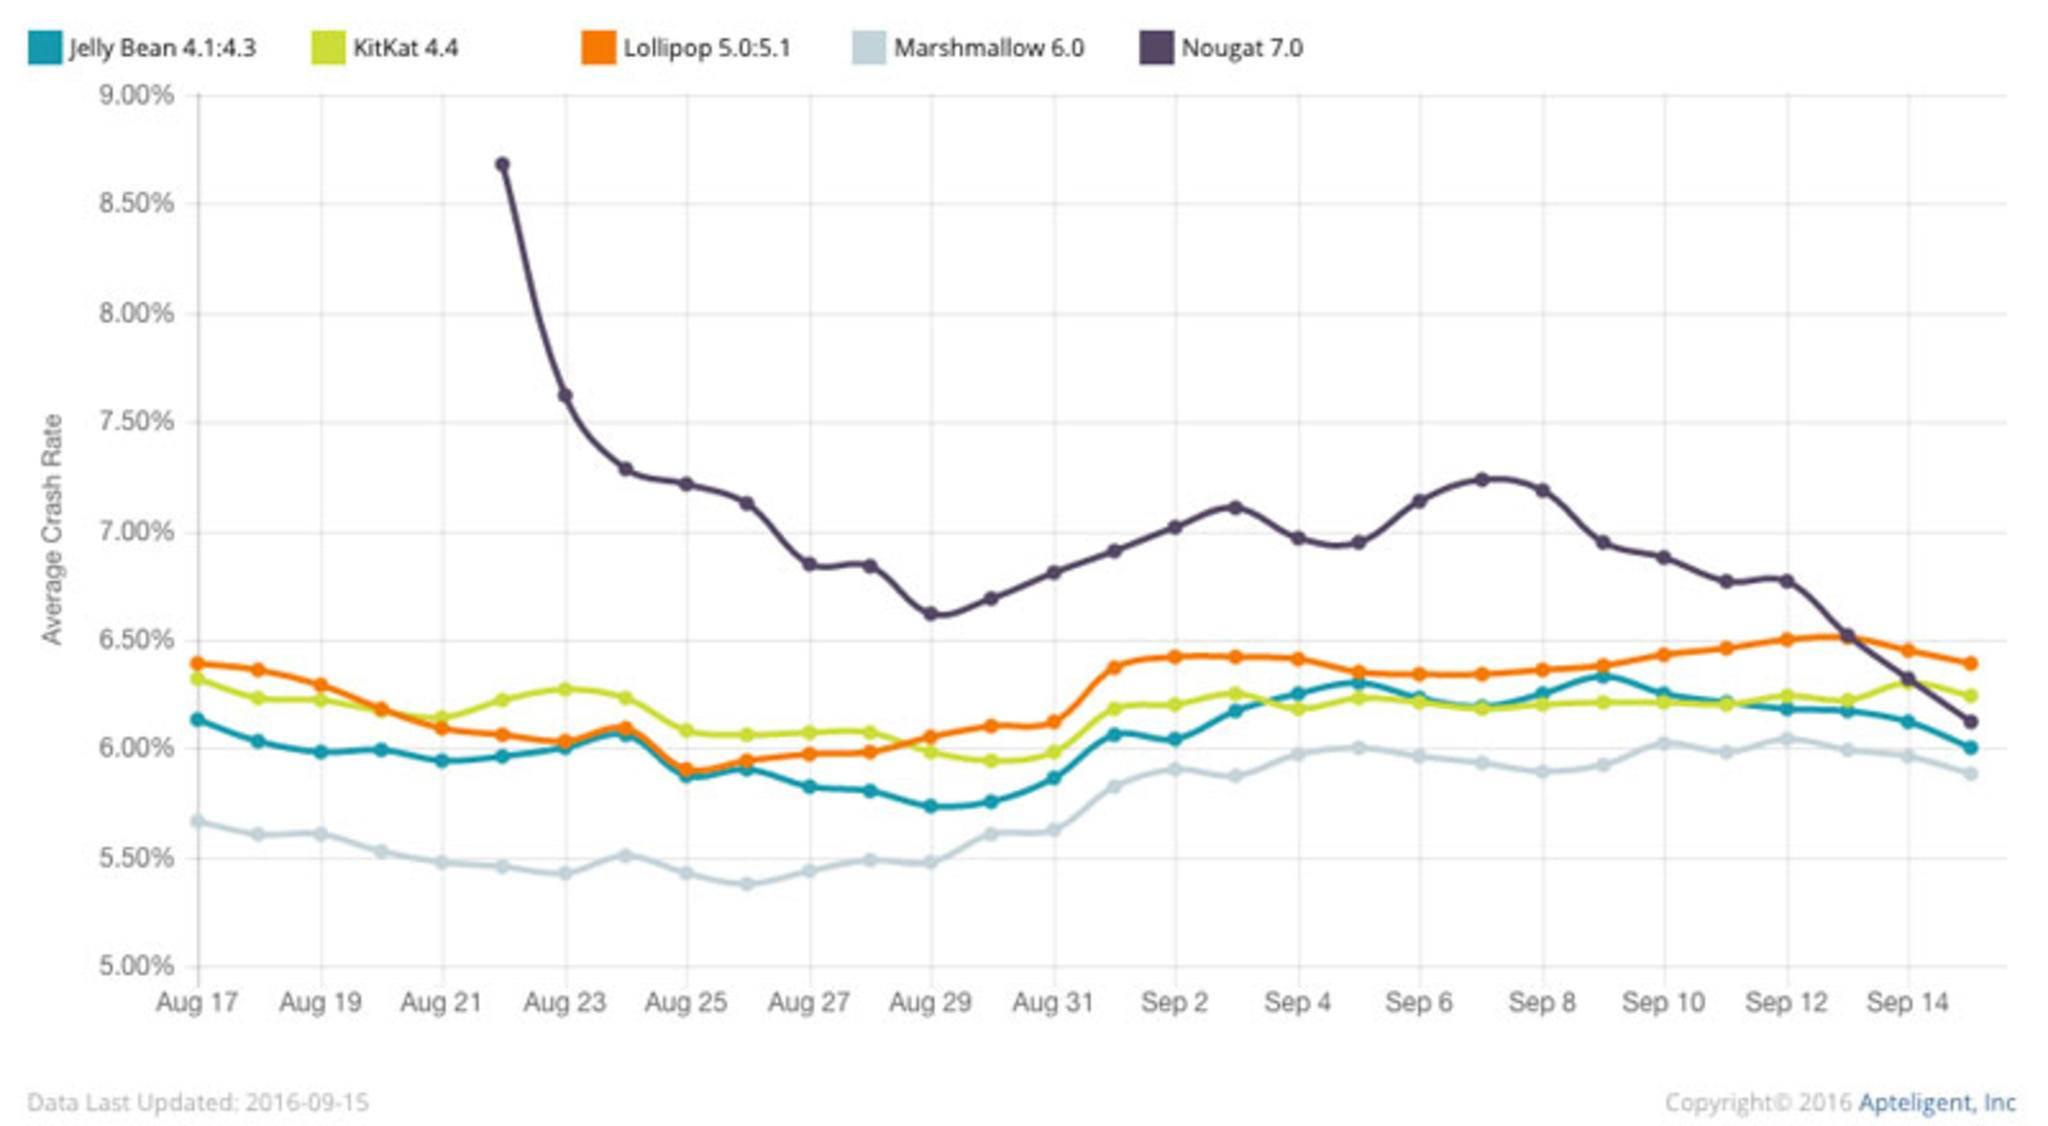 Android 7.0 fing ganz schwach an, scheint sich aber langsam zu fangen.